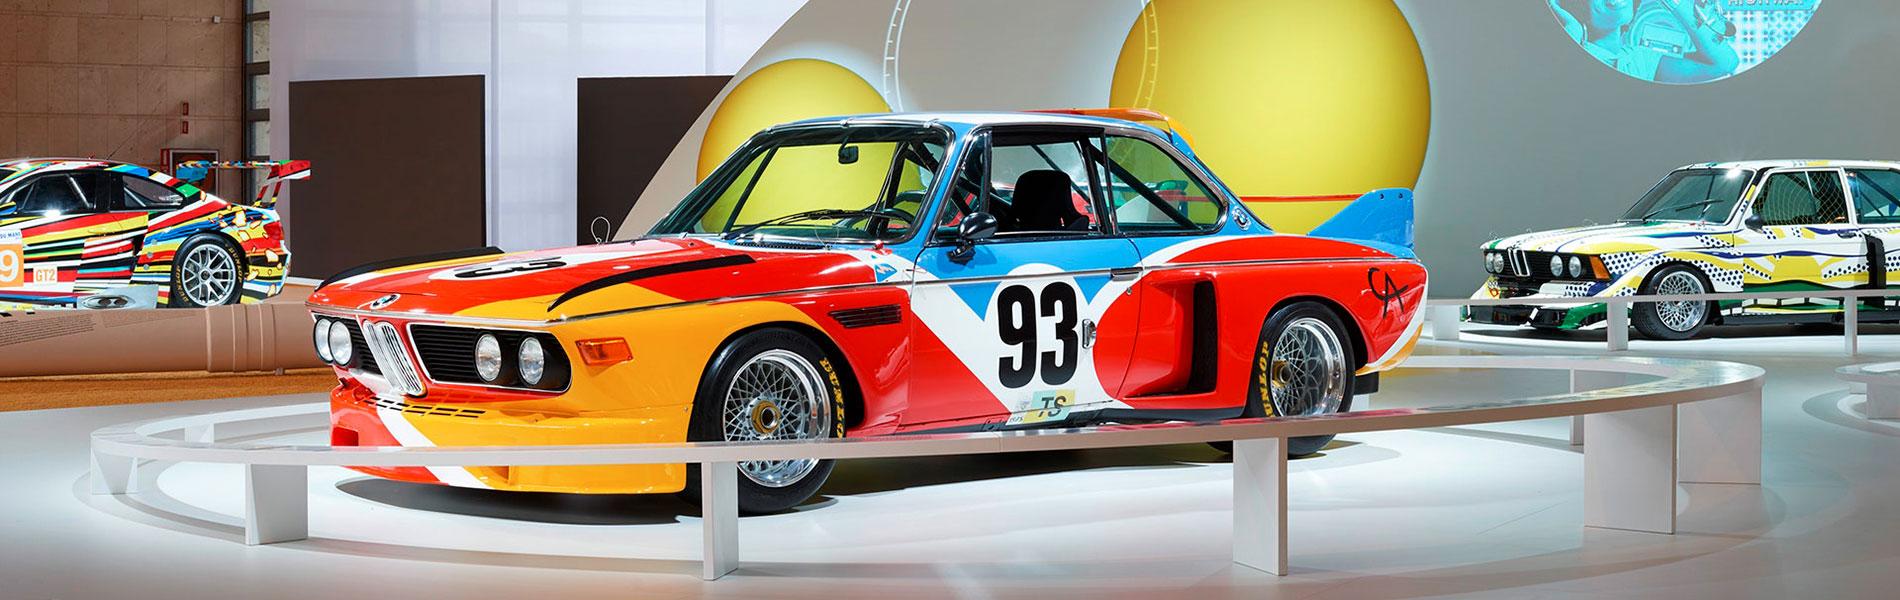 BMW Art Car Project - © BMW Group